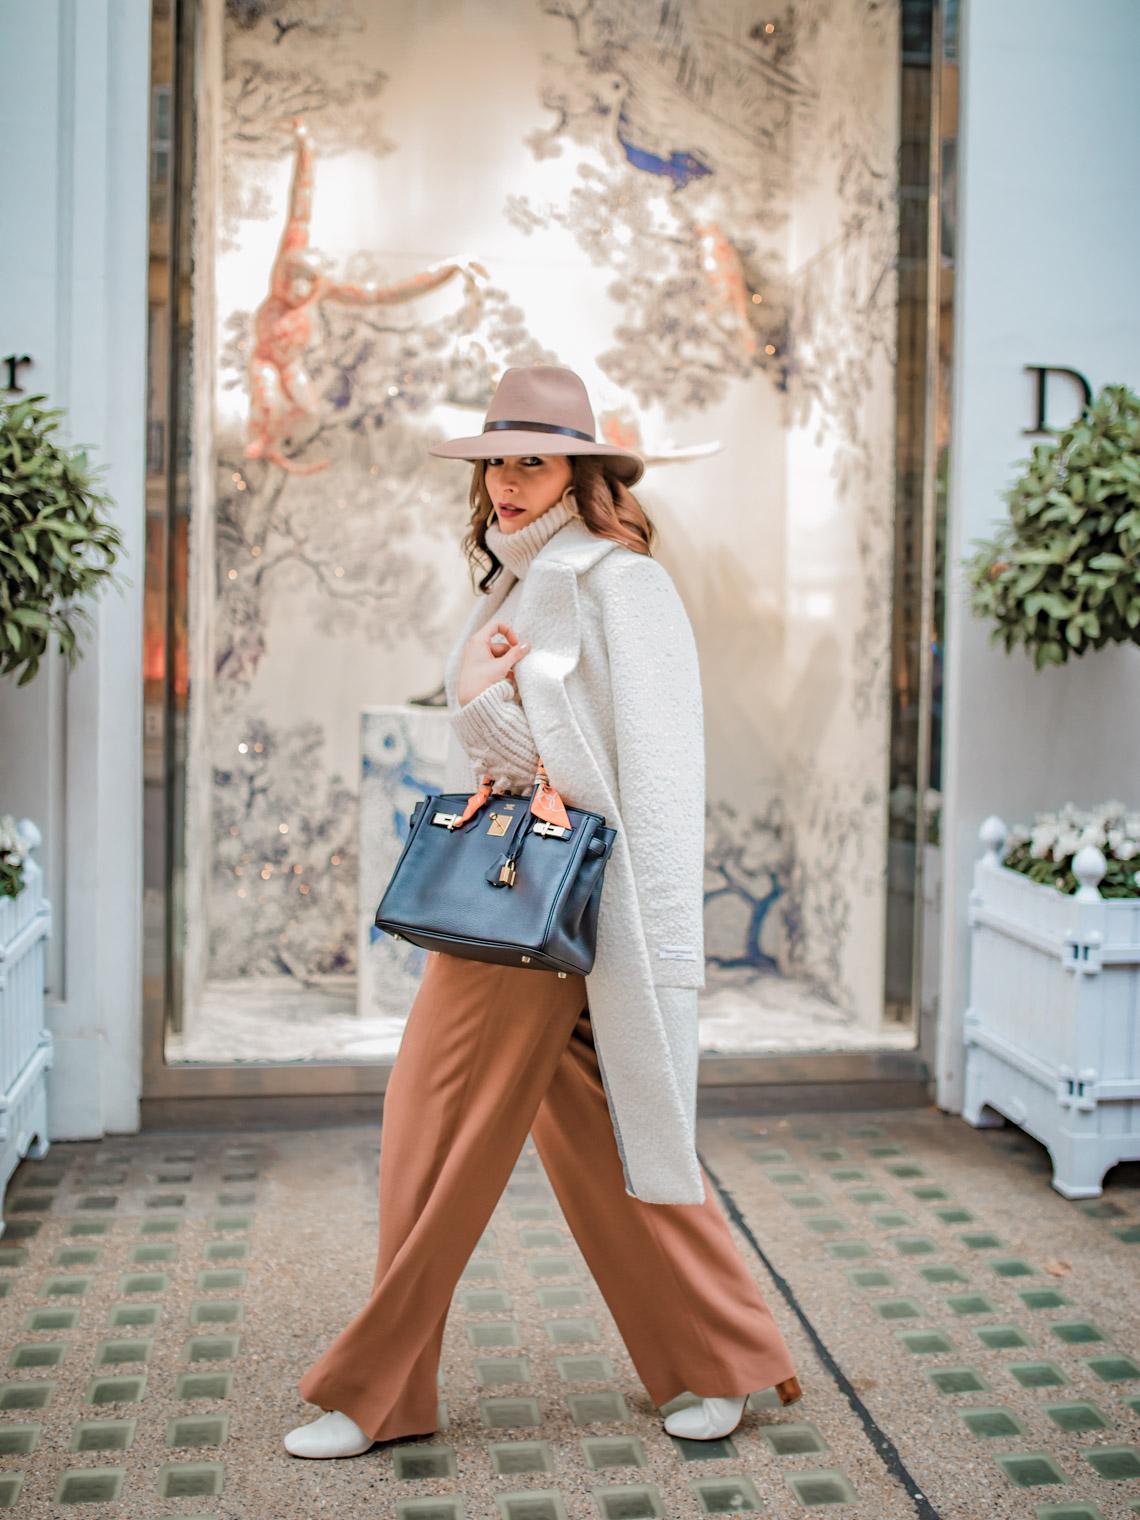 White shearling coat Hermes Birkin bag